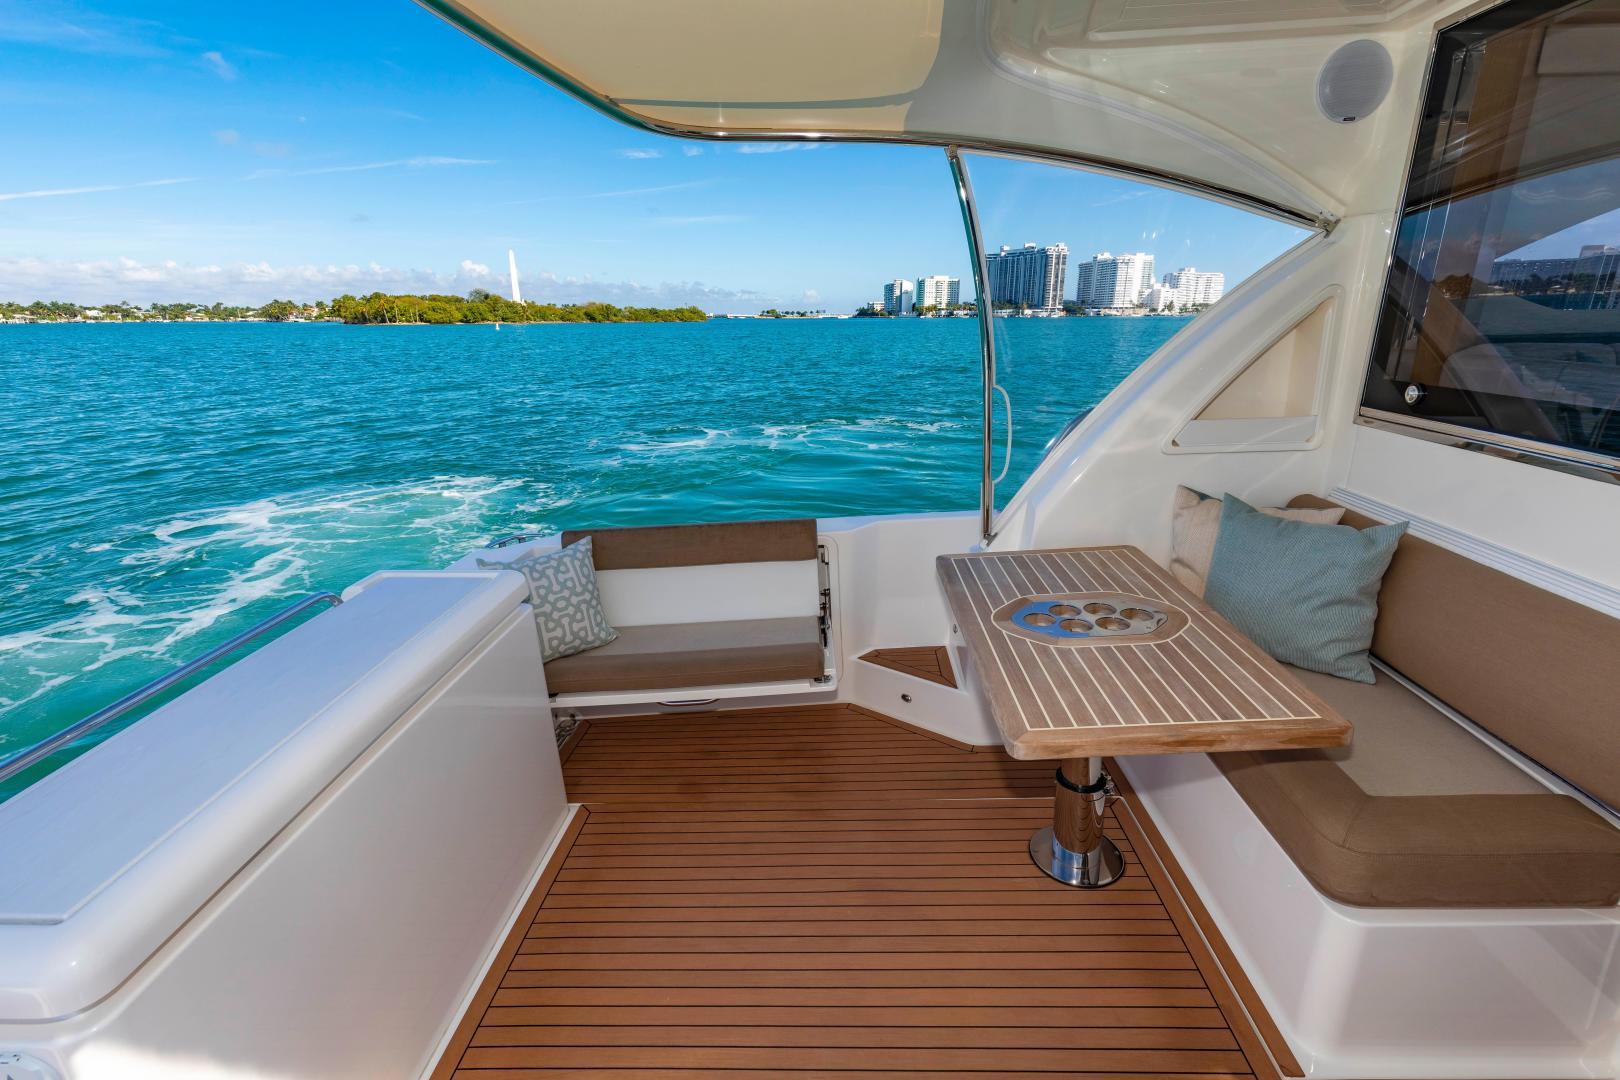 Riviera-395 SUV 2019-Ipanema Miami Beach-Florida-United States-1614884   Thumbnail